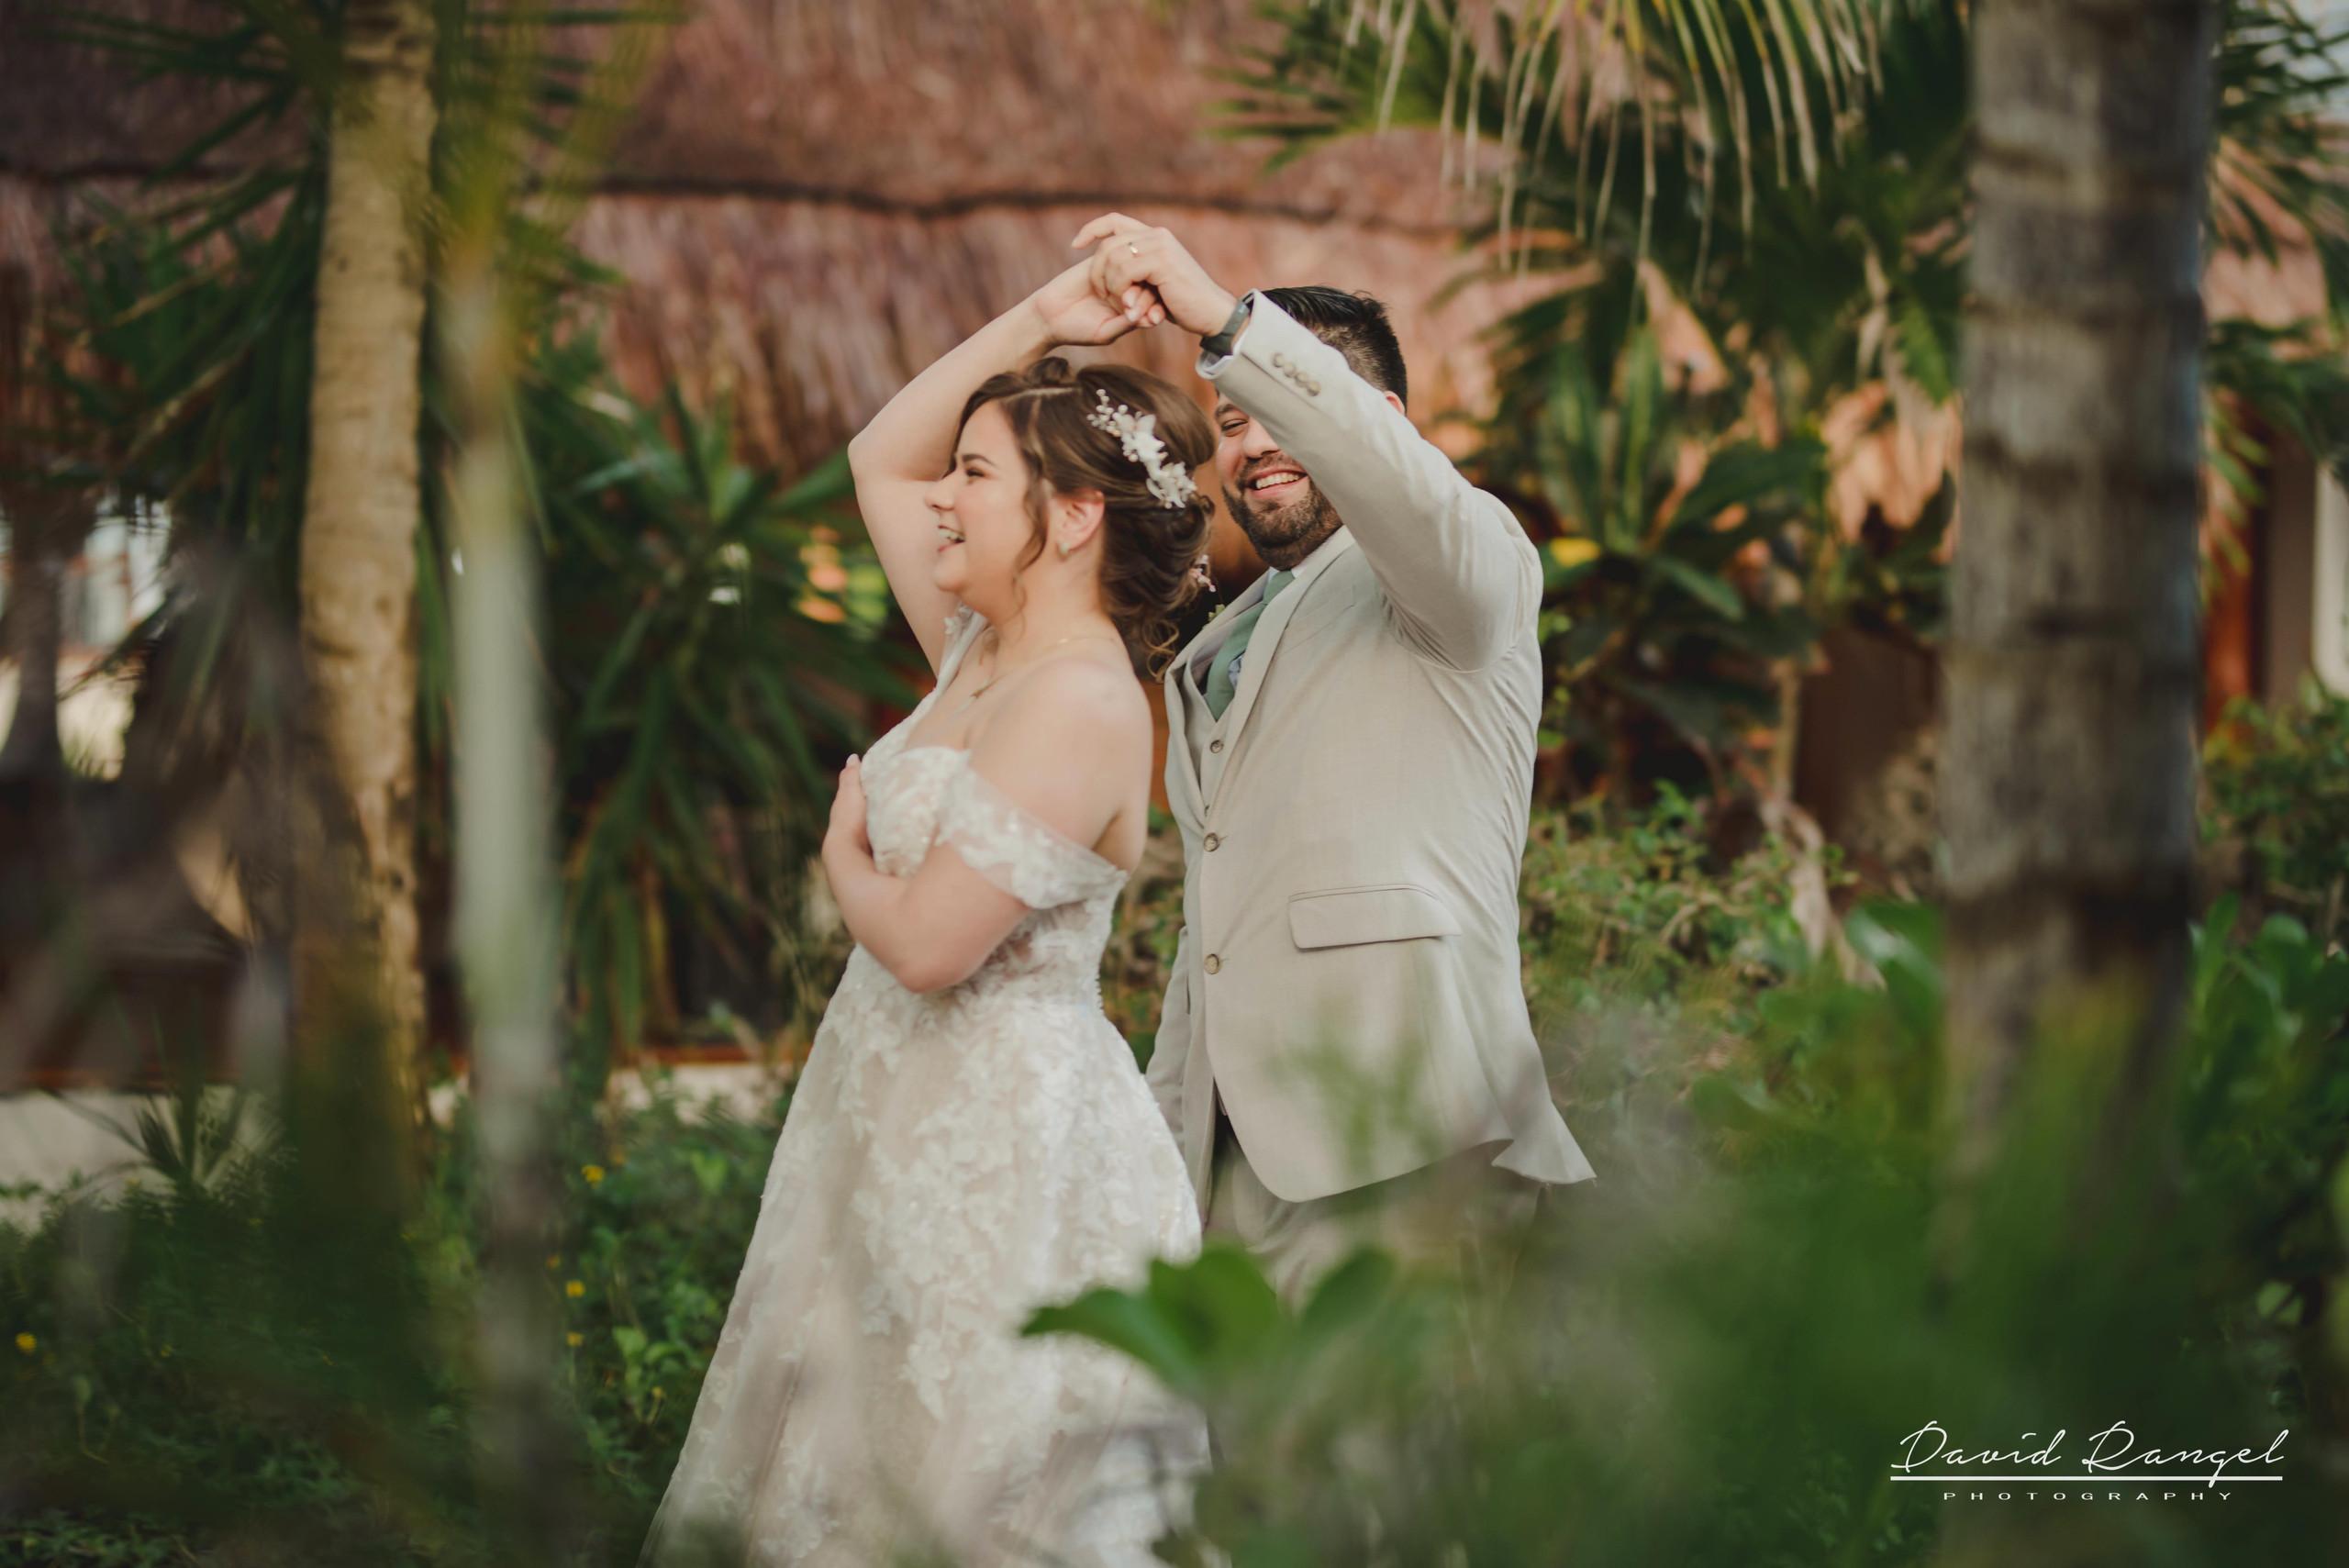 bride+candy+shot+beach+isla+blanca+villa+chenera+photo+costa+mujeres+first+look+groom+surprise+garden+wedding+dress+suit+tie